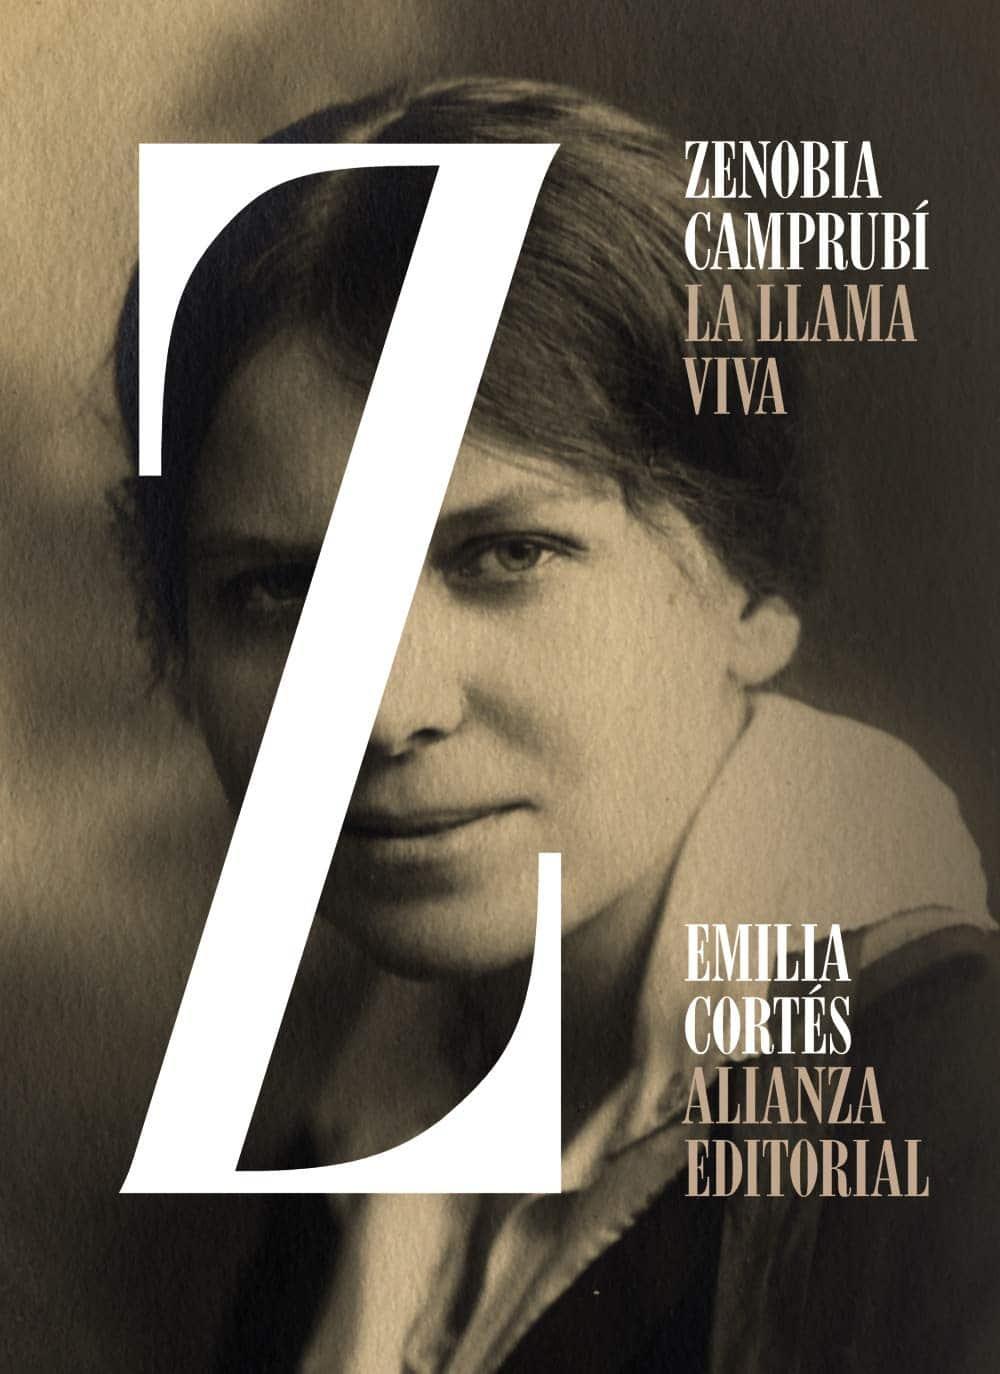 Zenobia Camprubí. La llama viva